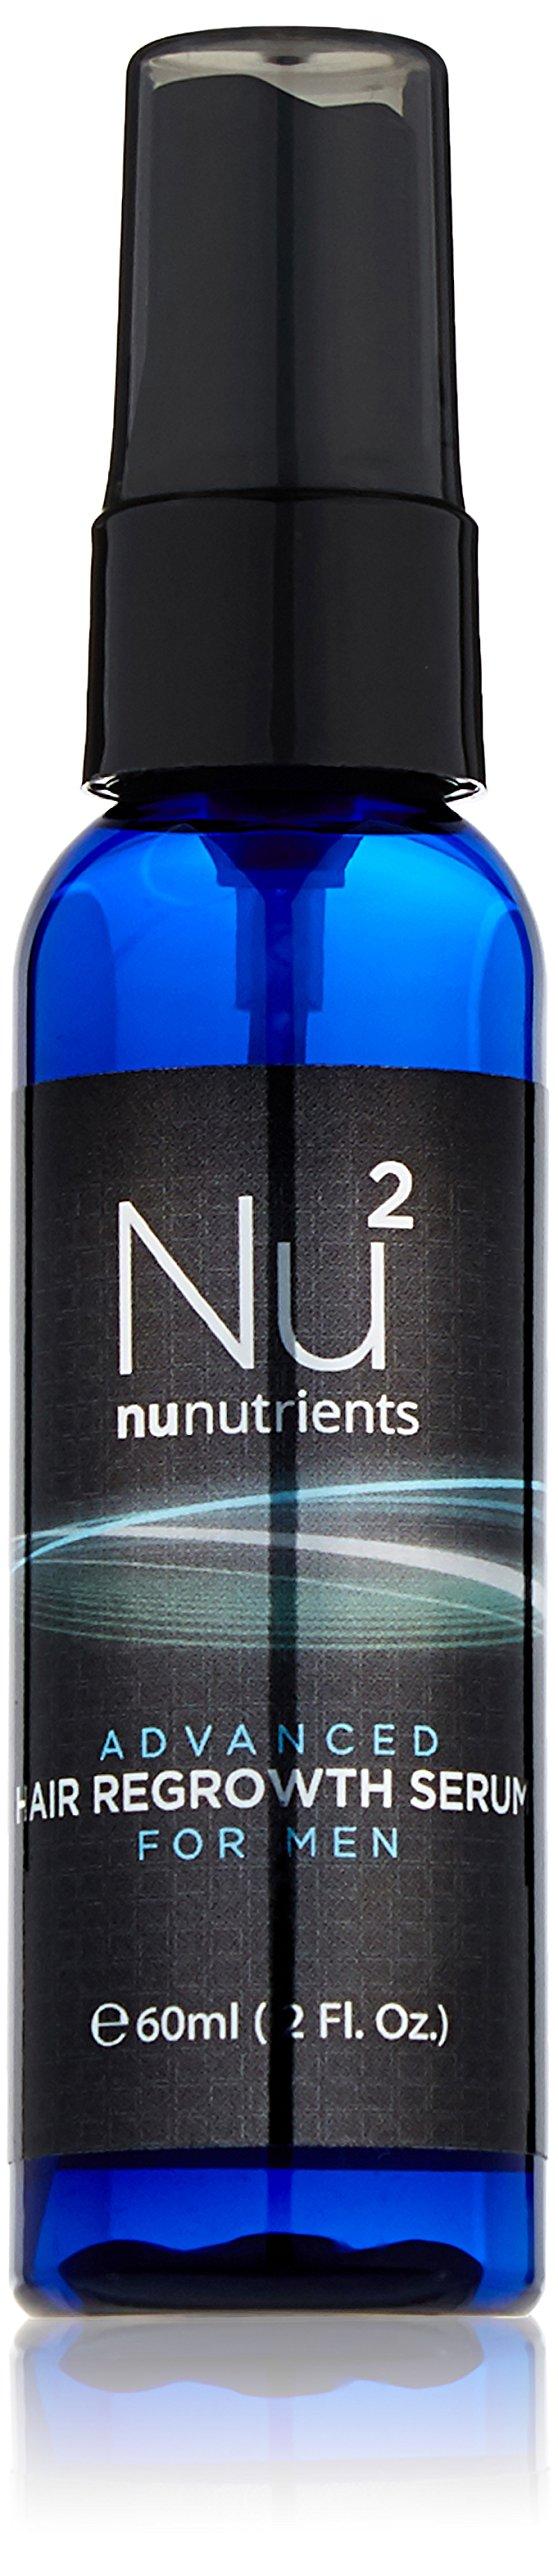 NuNutrients Advanced Hair Regrowth Treatment for Men - Easy-to-use Spray Bottle (One Bottle - 2 FL Oz)